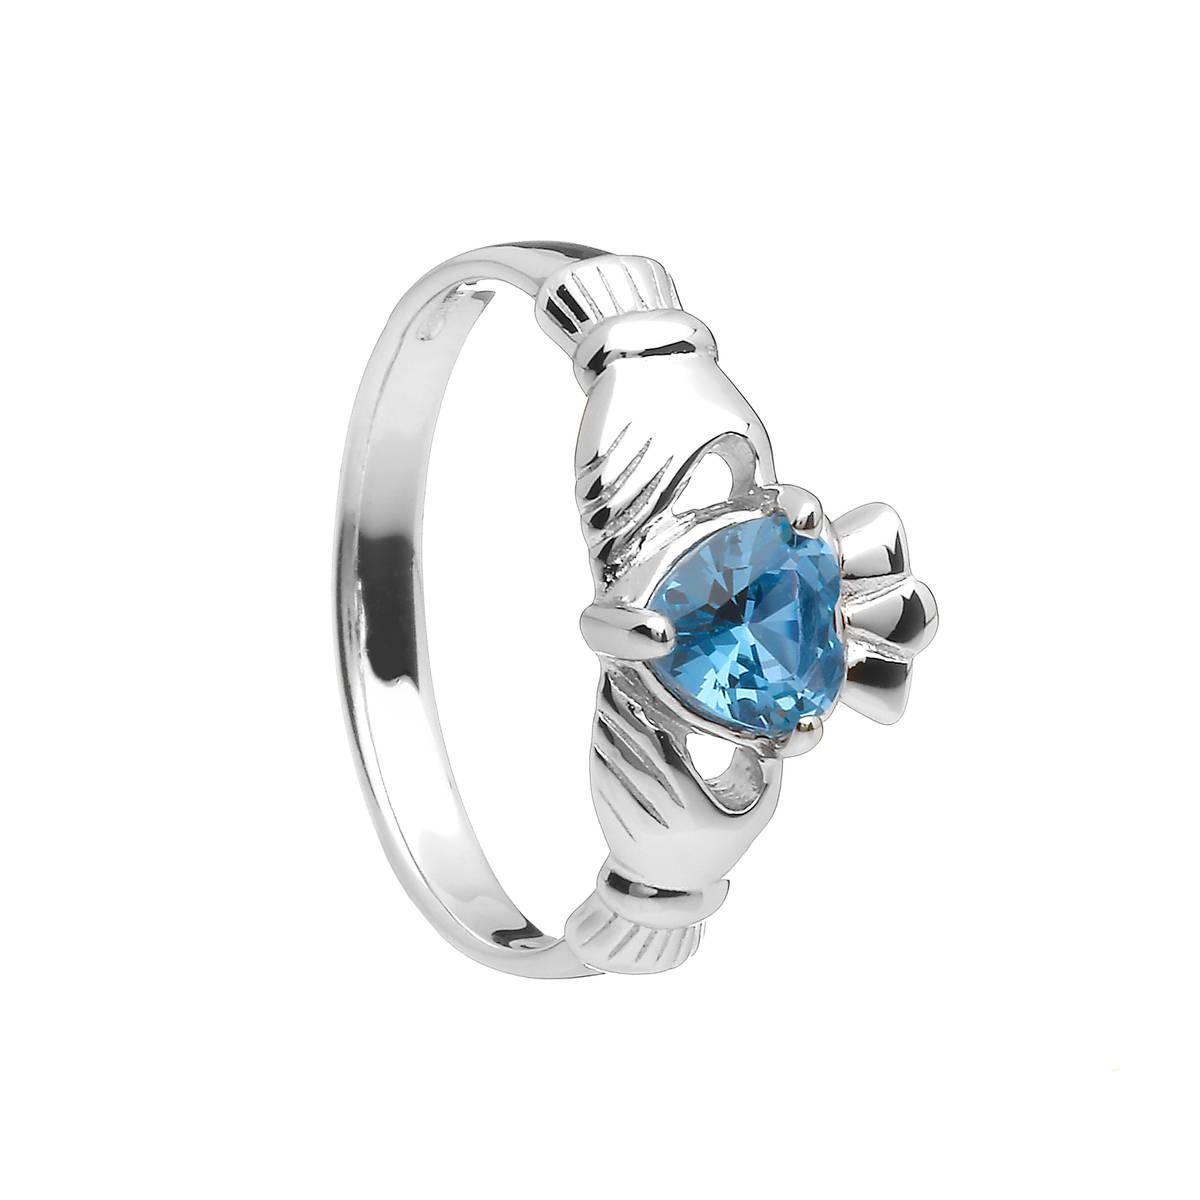 Sterling Silver Classic December Birthstone Claddagh Ring